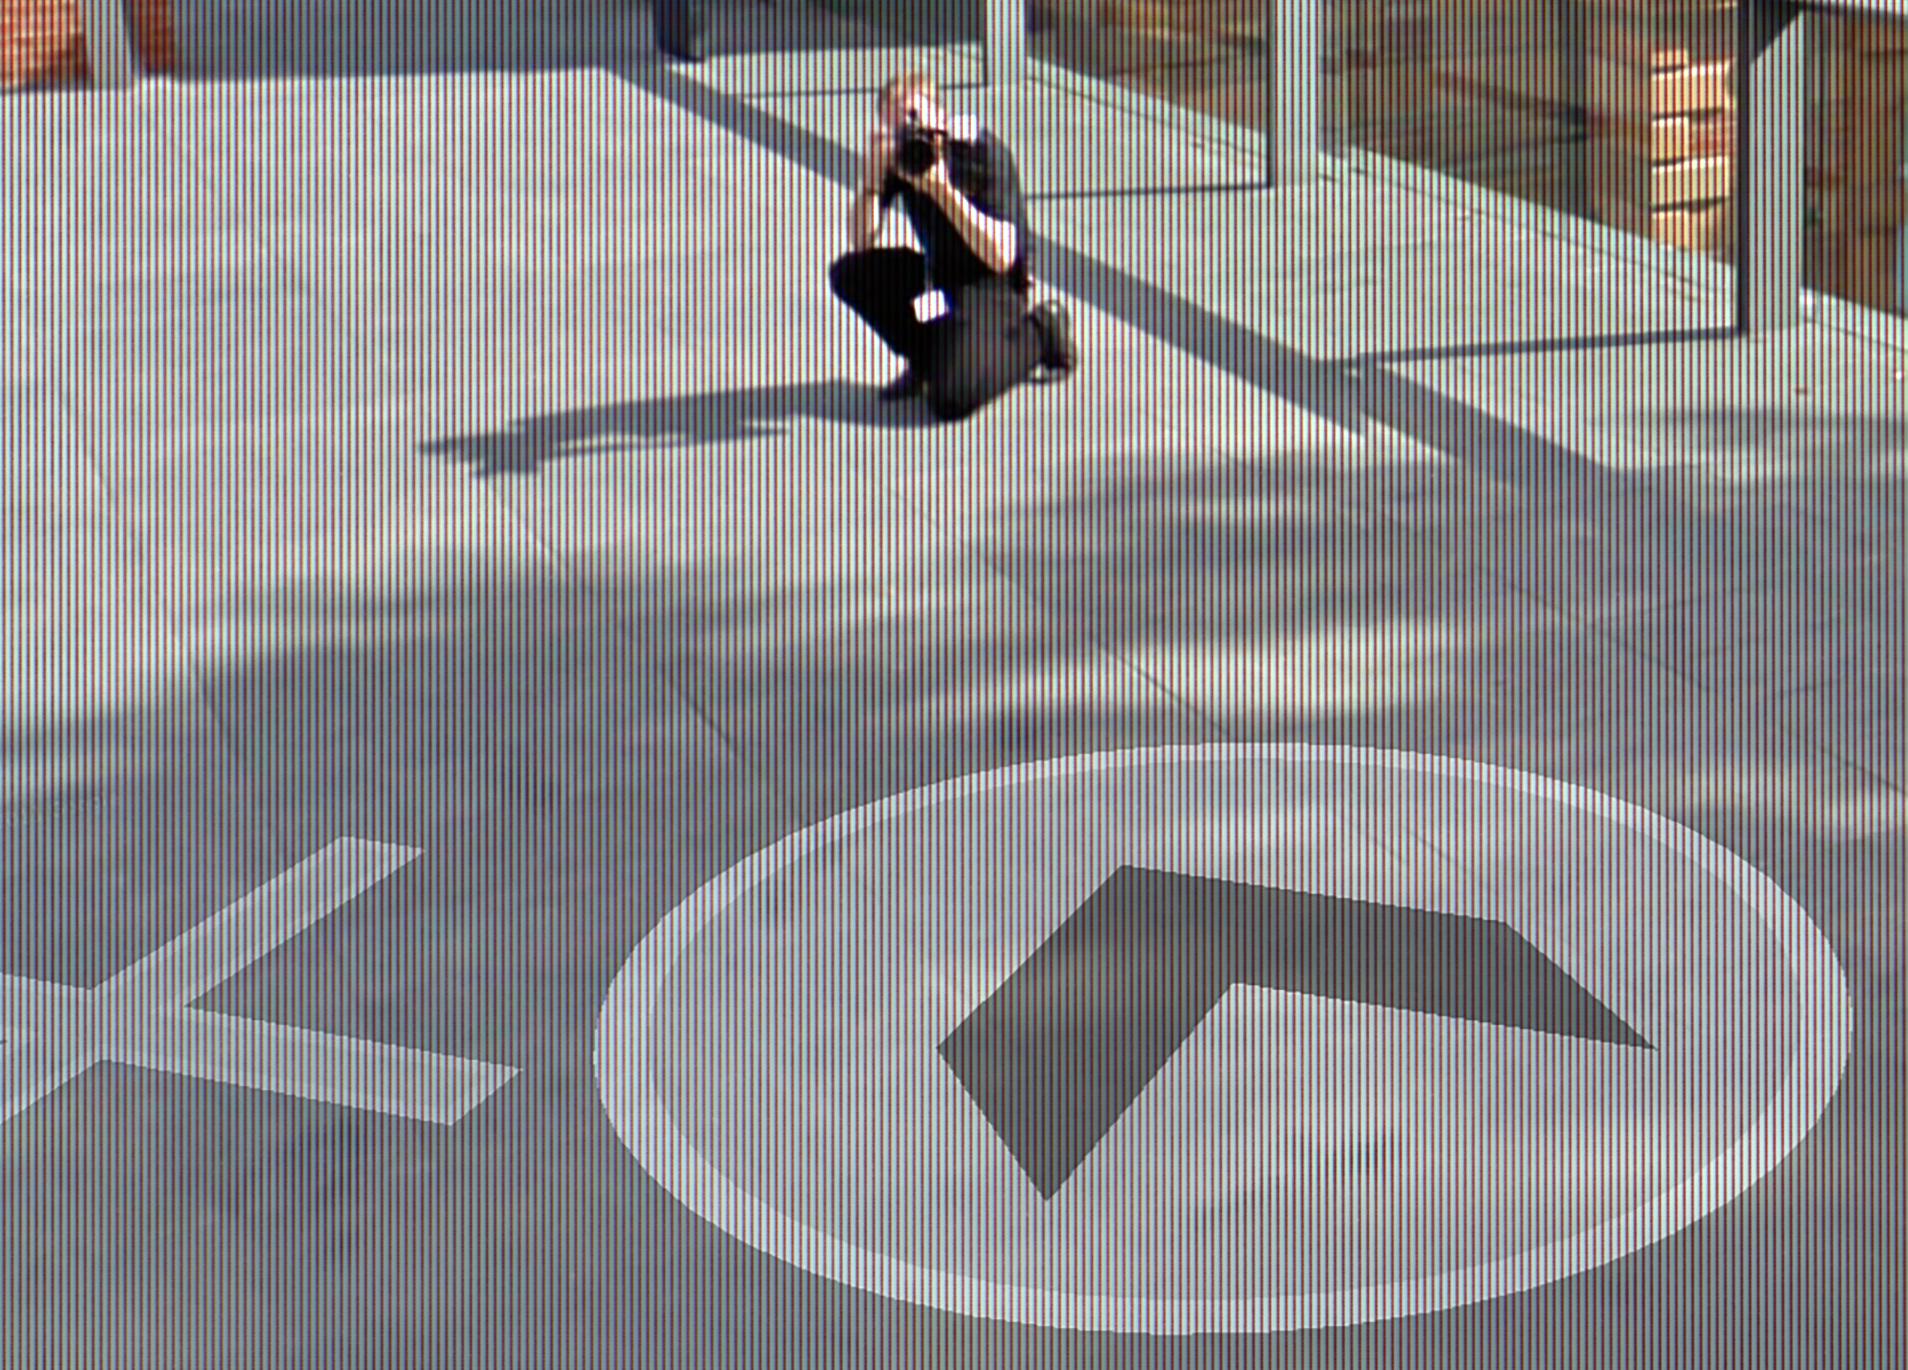 favourite_1_observatorium_streetview-kopie